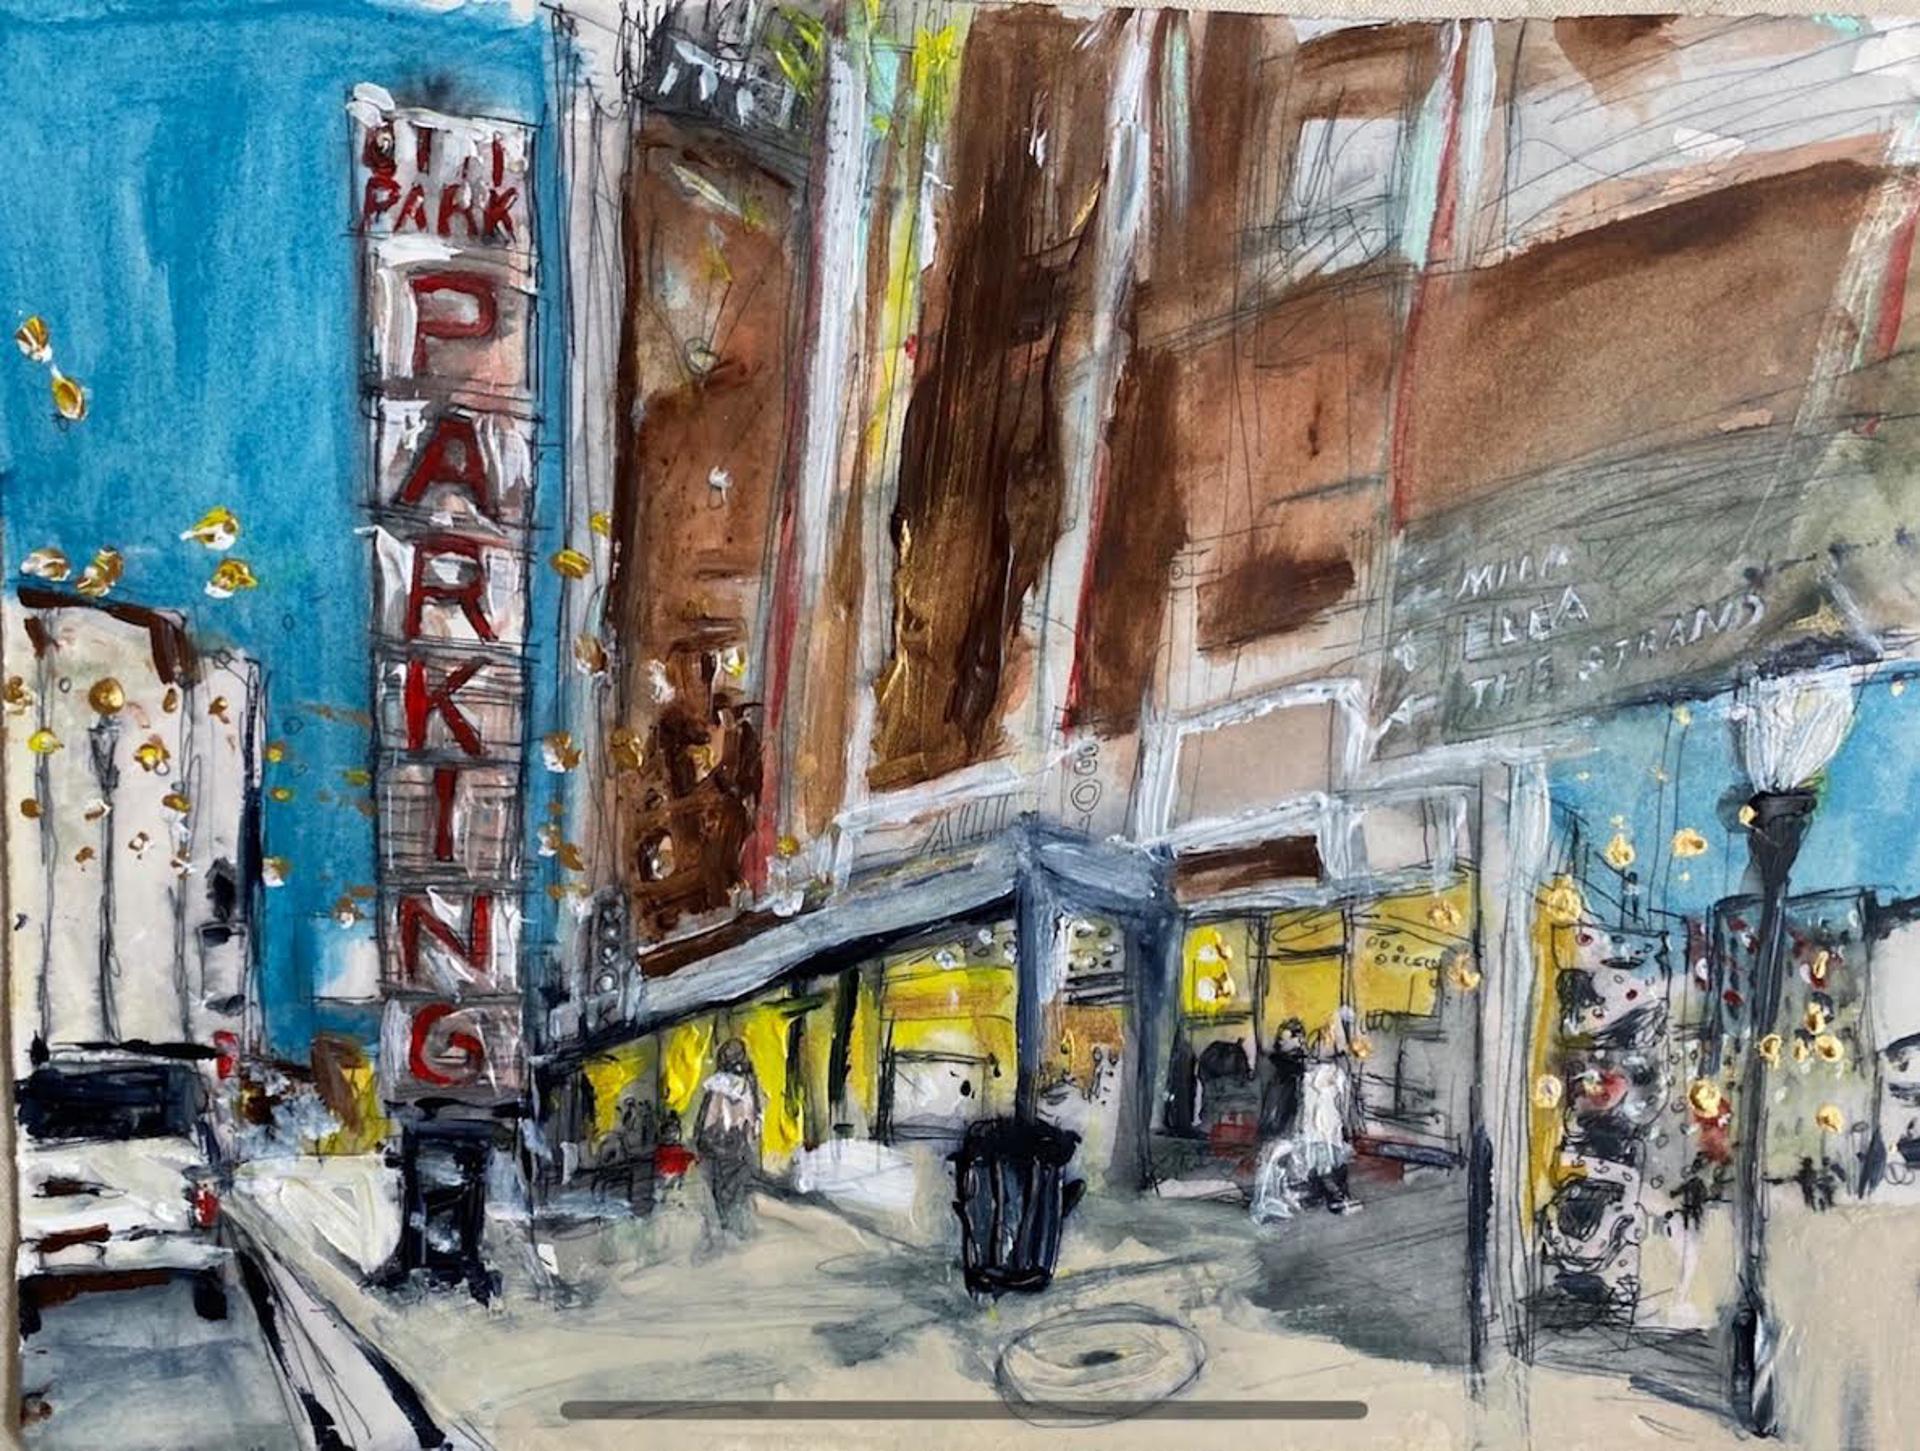 8th Avenue - Chattanooga by Ana Guzman